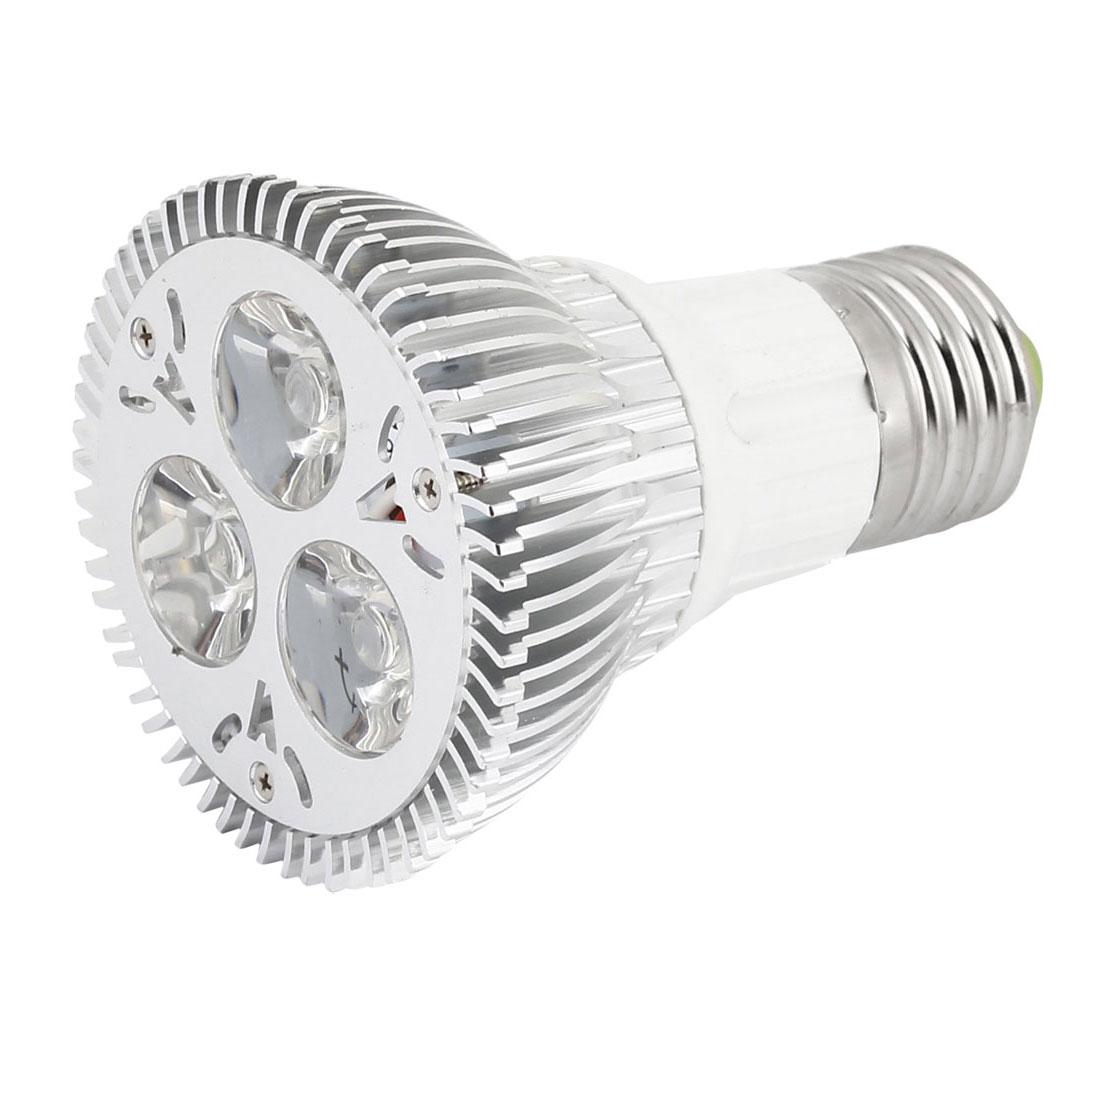 AC 85-265V 3x3W E27 Dimmable Warm White Light Par20 LED Spotlight Downlight